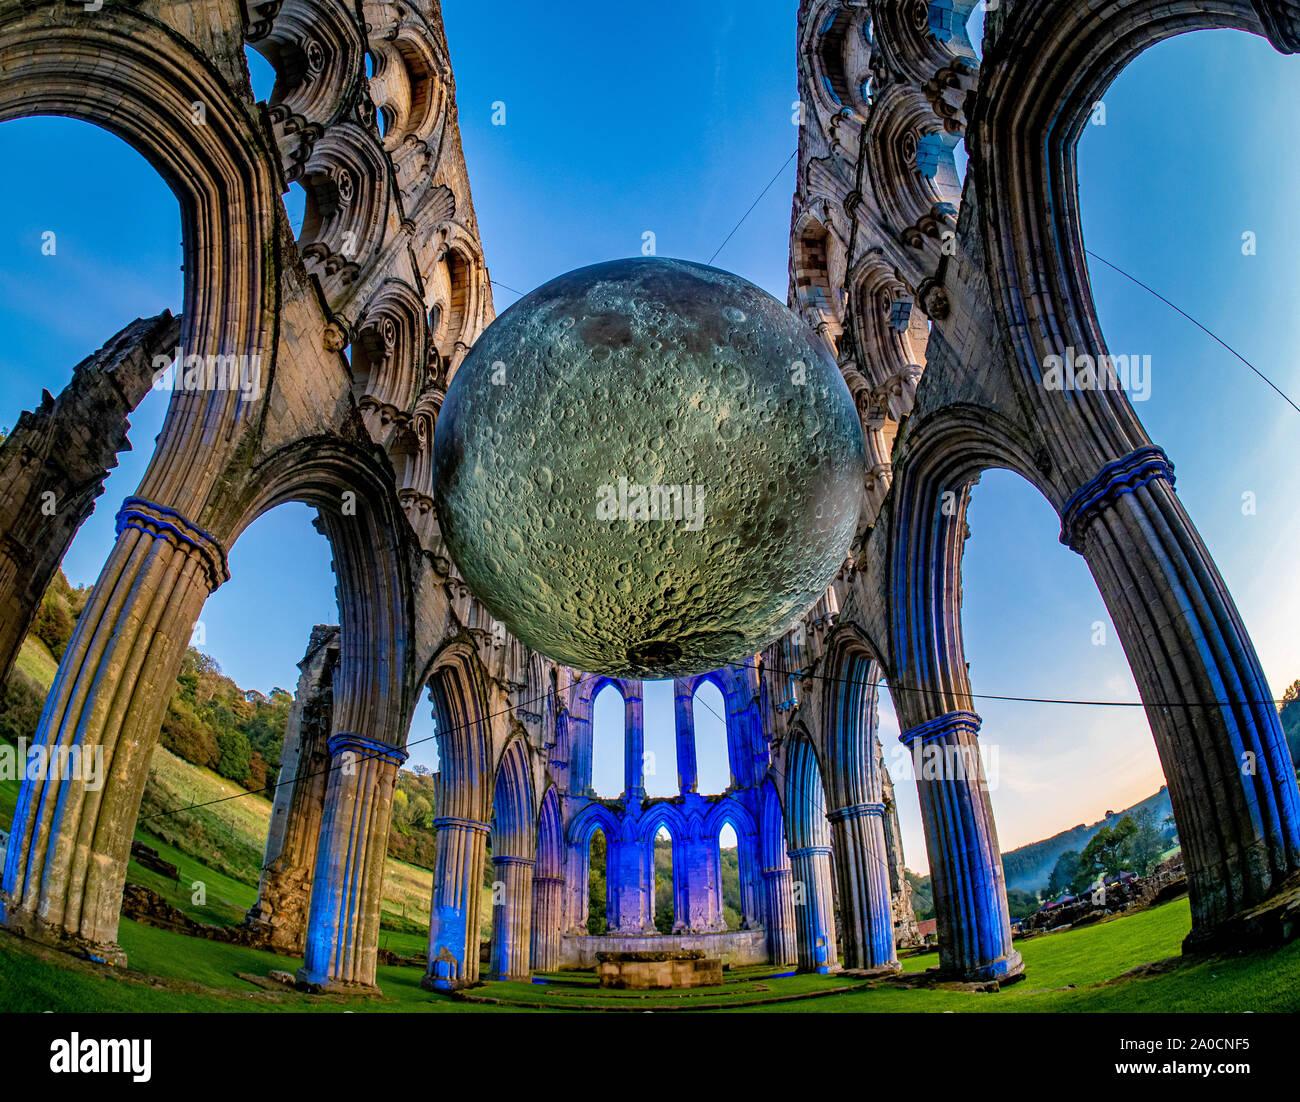 ILLUMINATING RIEVAULX event at Rievaulx Abbey, North Yorkshire, UK. Featuring Museum of the Moon, by Luke Jerram. Stock Photo